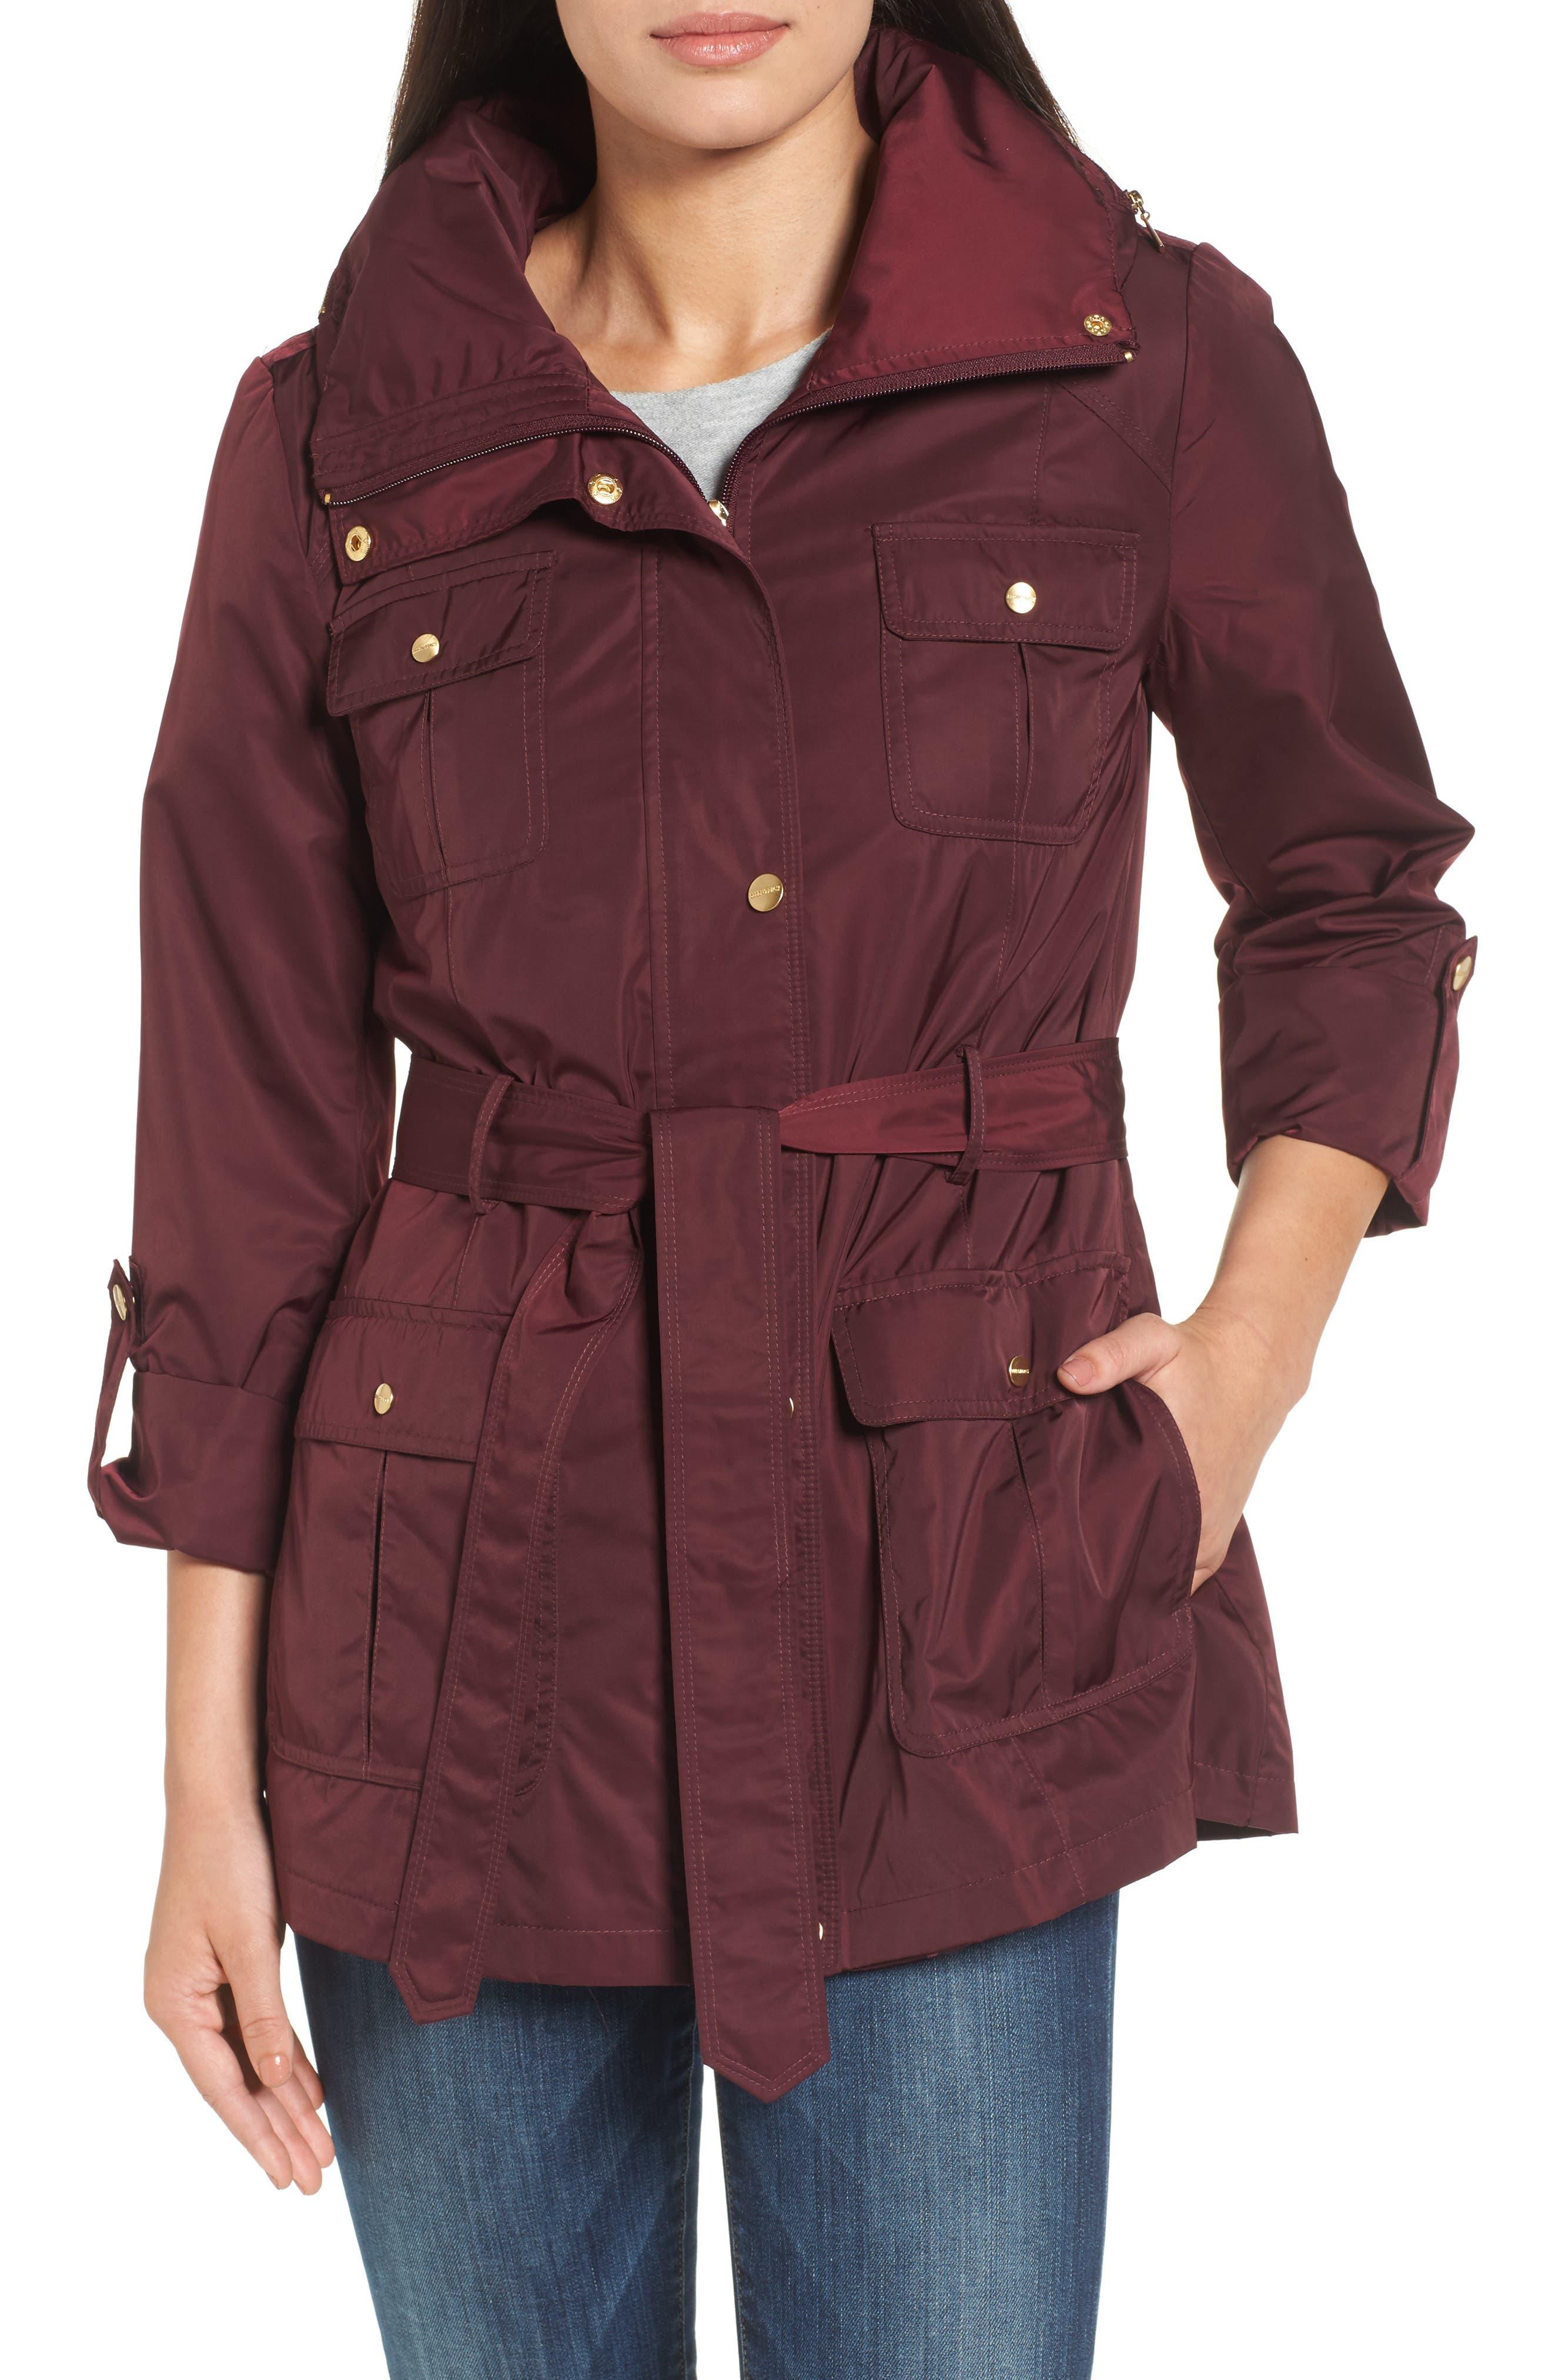 Techno Short Trench Coat,                         Main,                         color, Burgundy